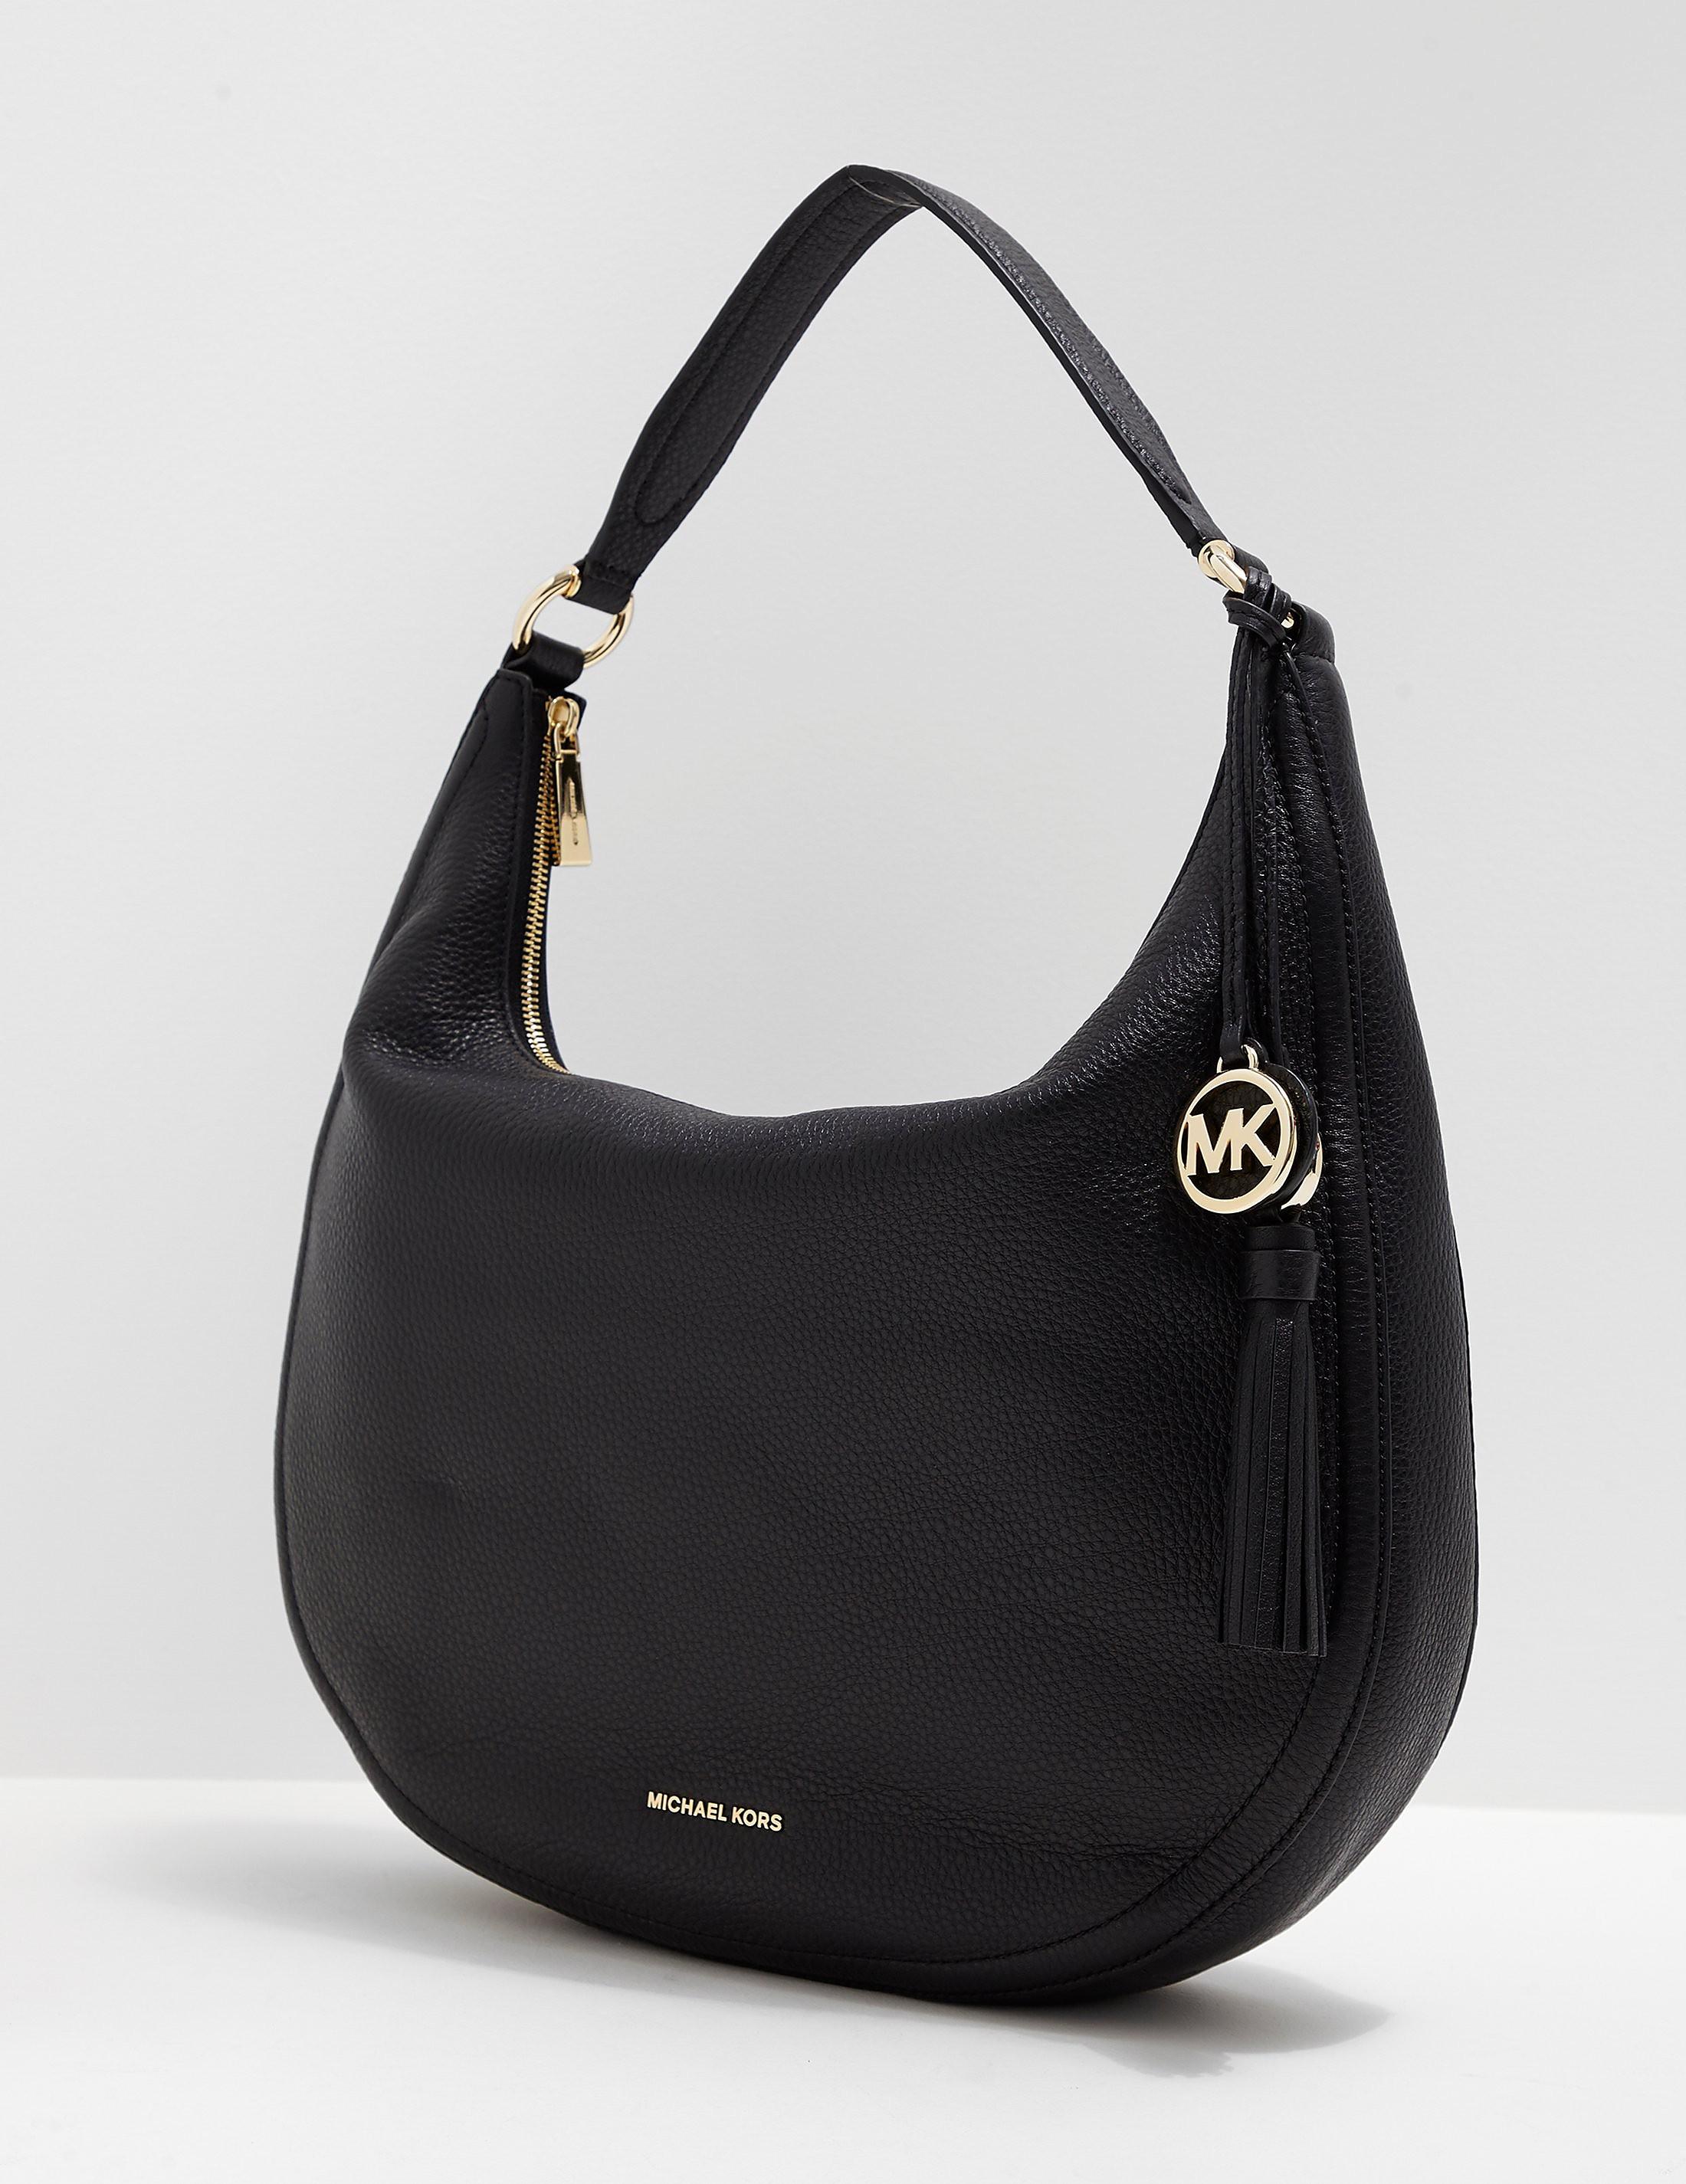 Michael Kors Lydia Hobo Shoulder Bag